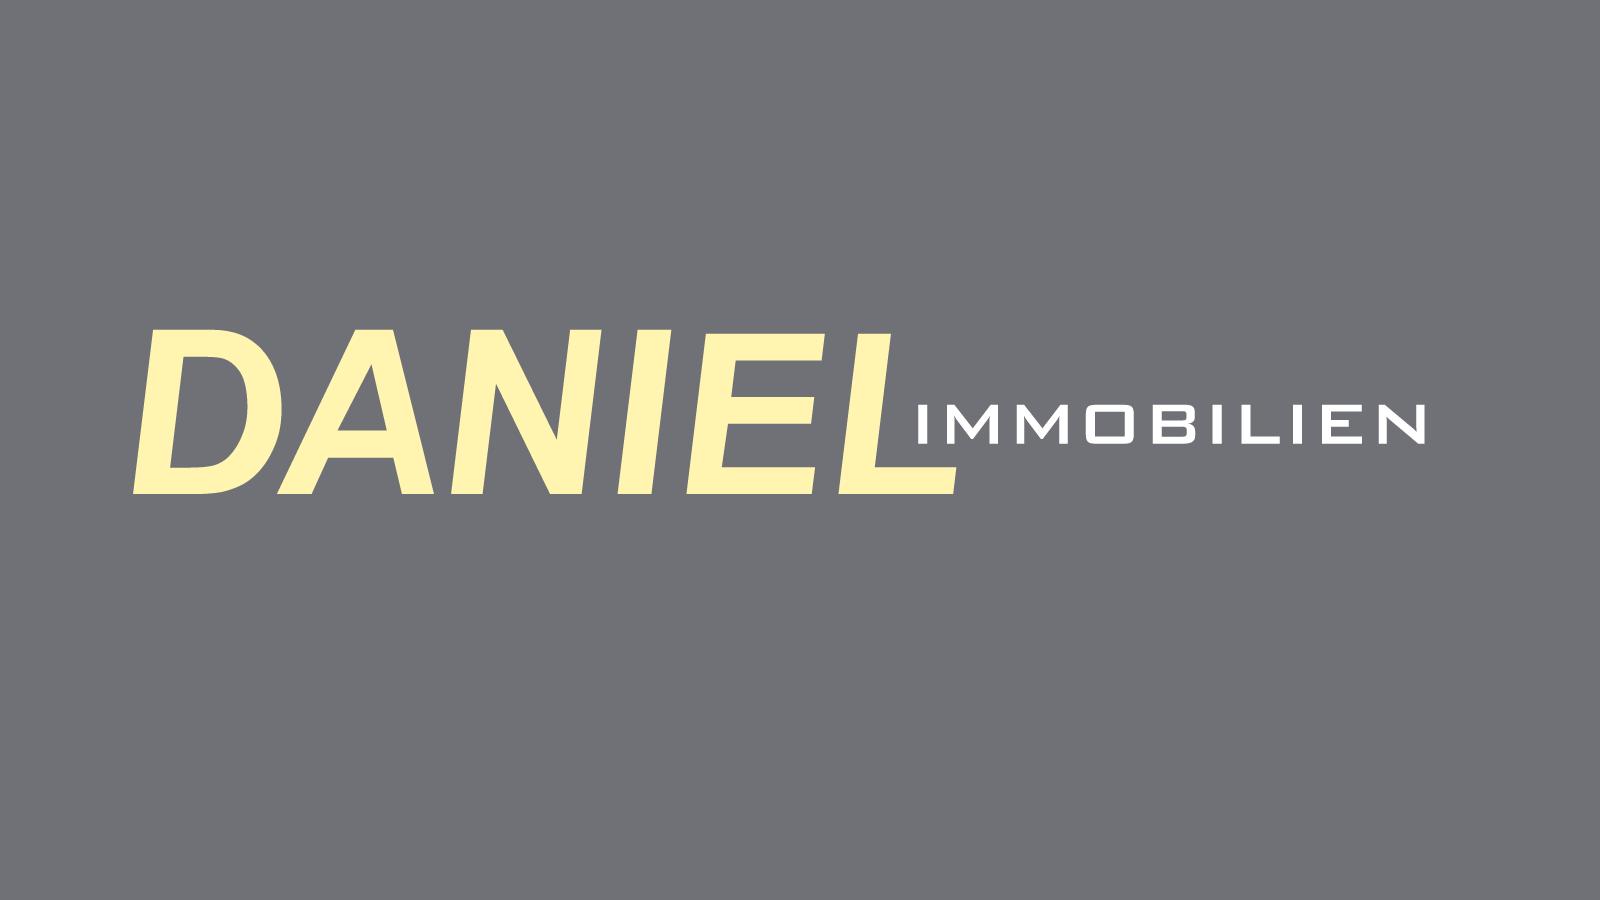 daniel_1600x900